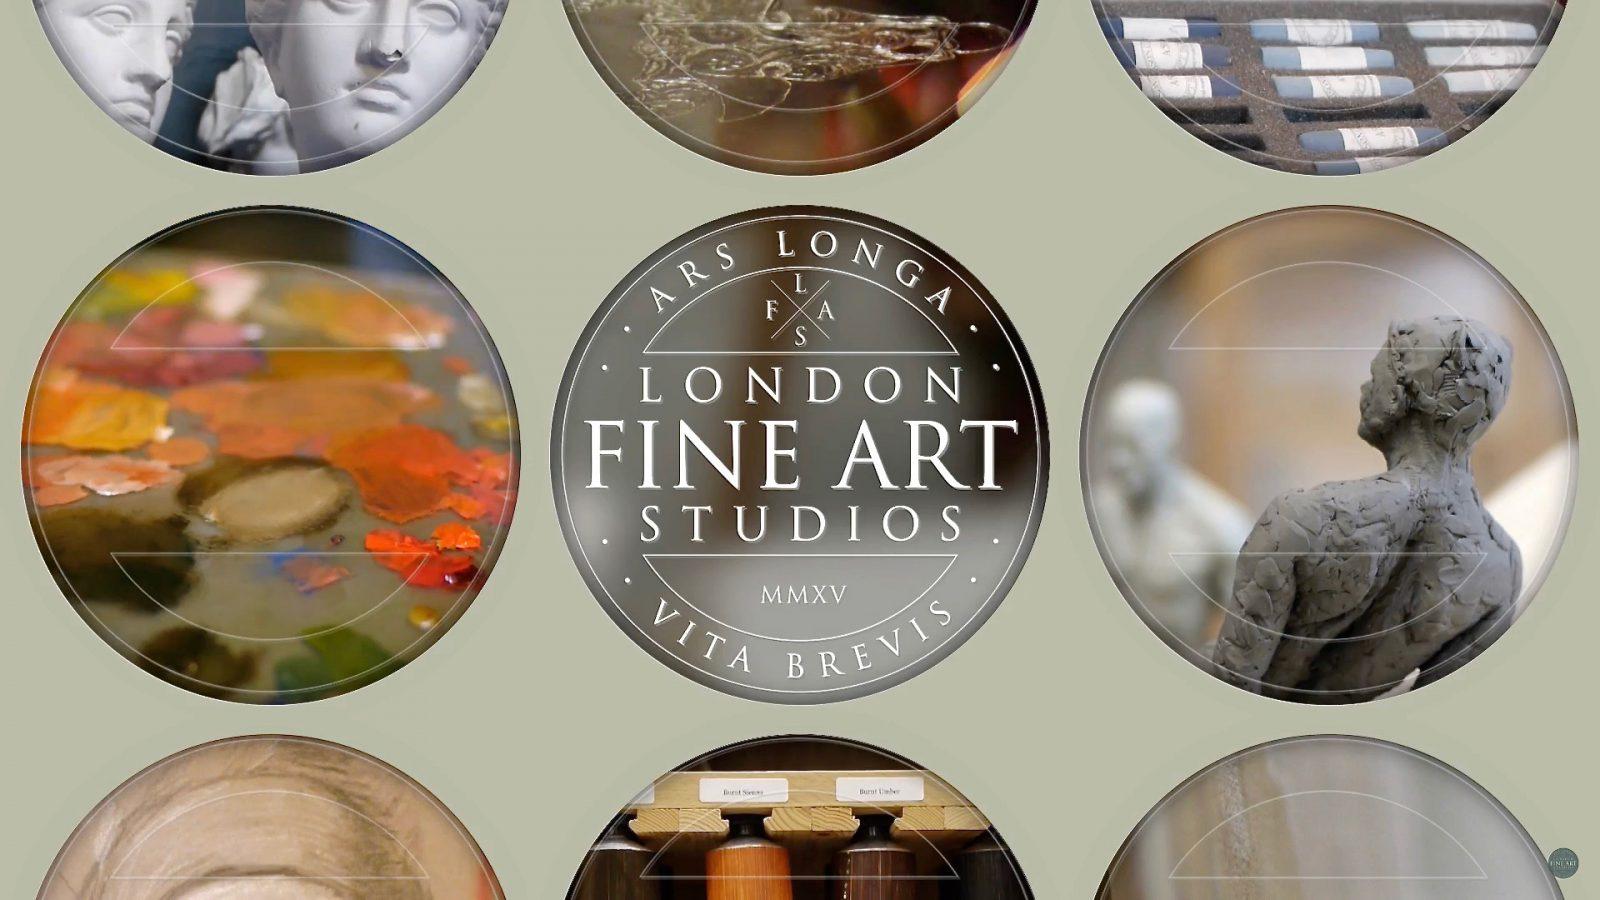 London Fine Art Studios: An insight